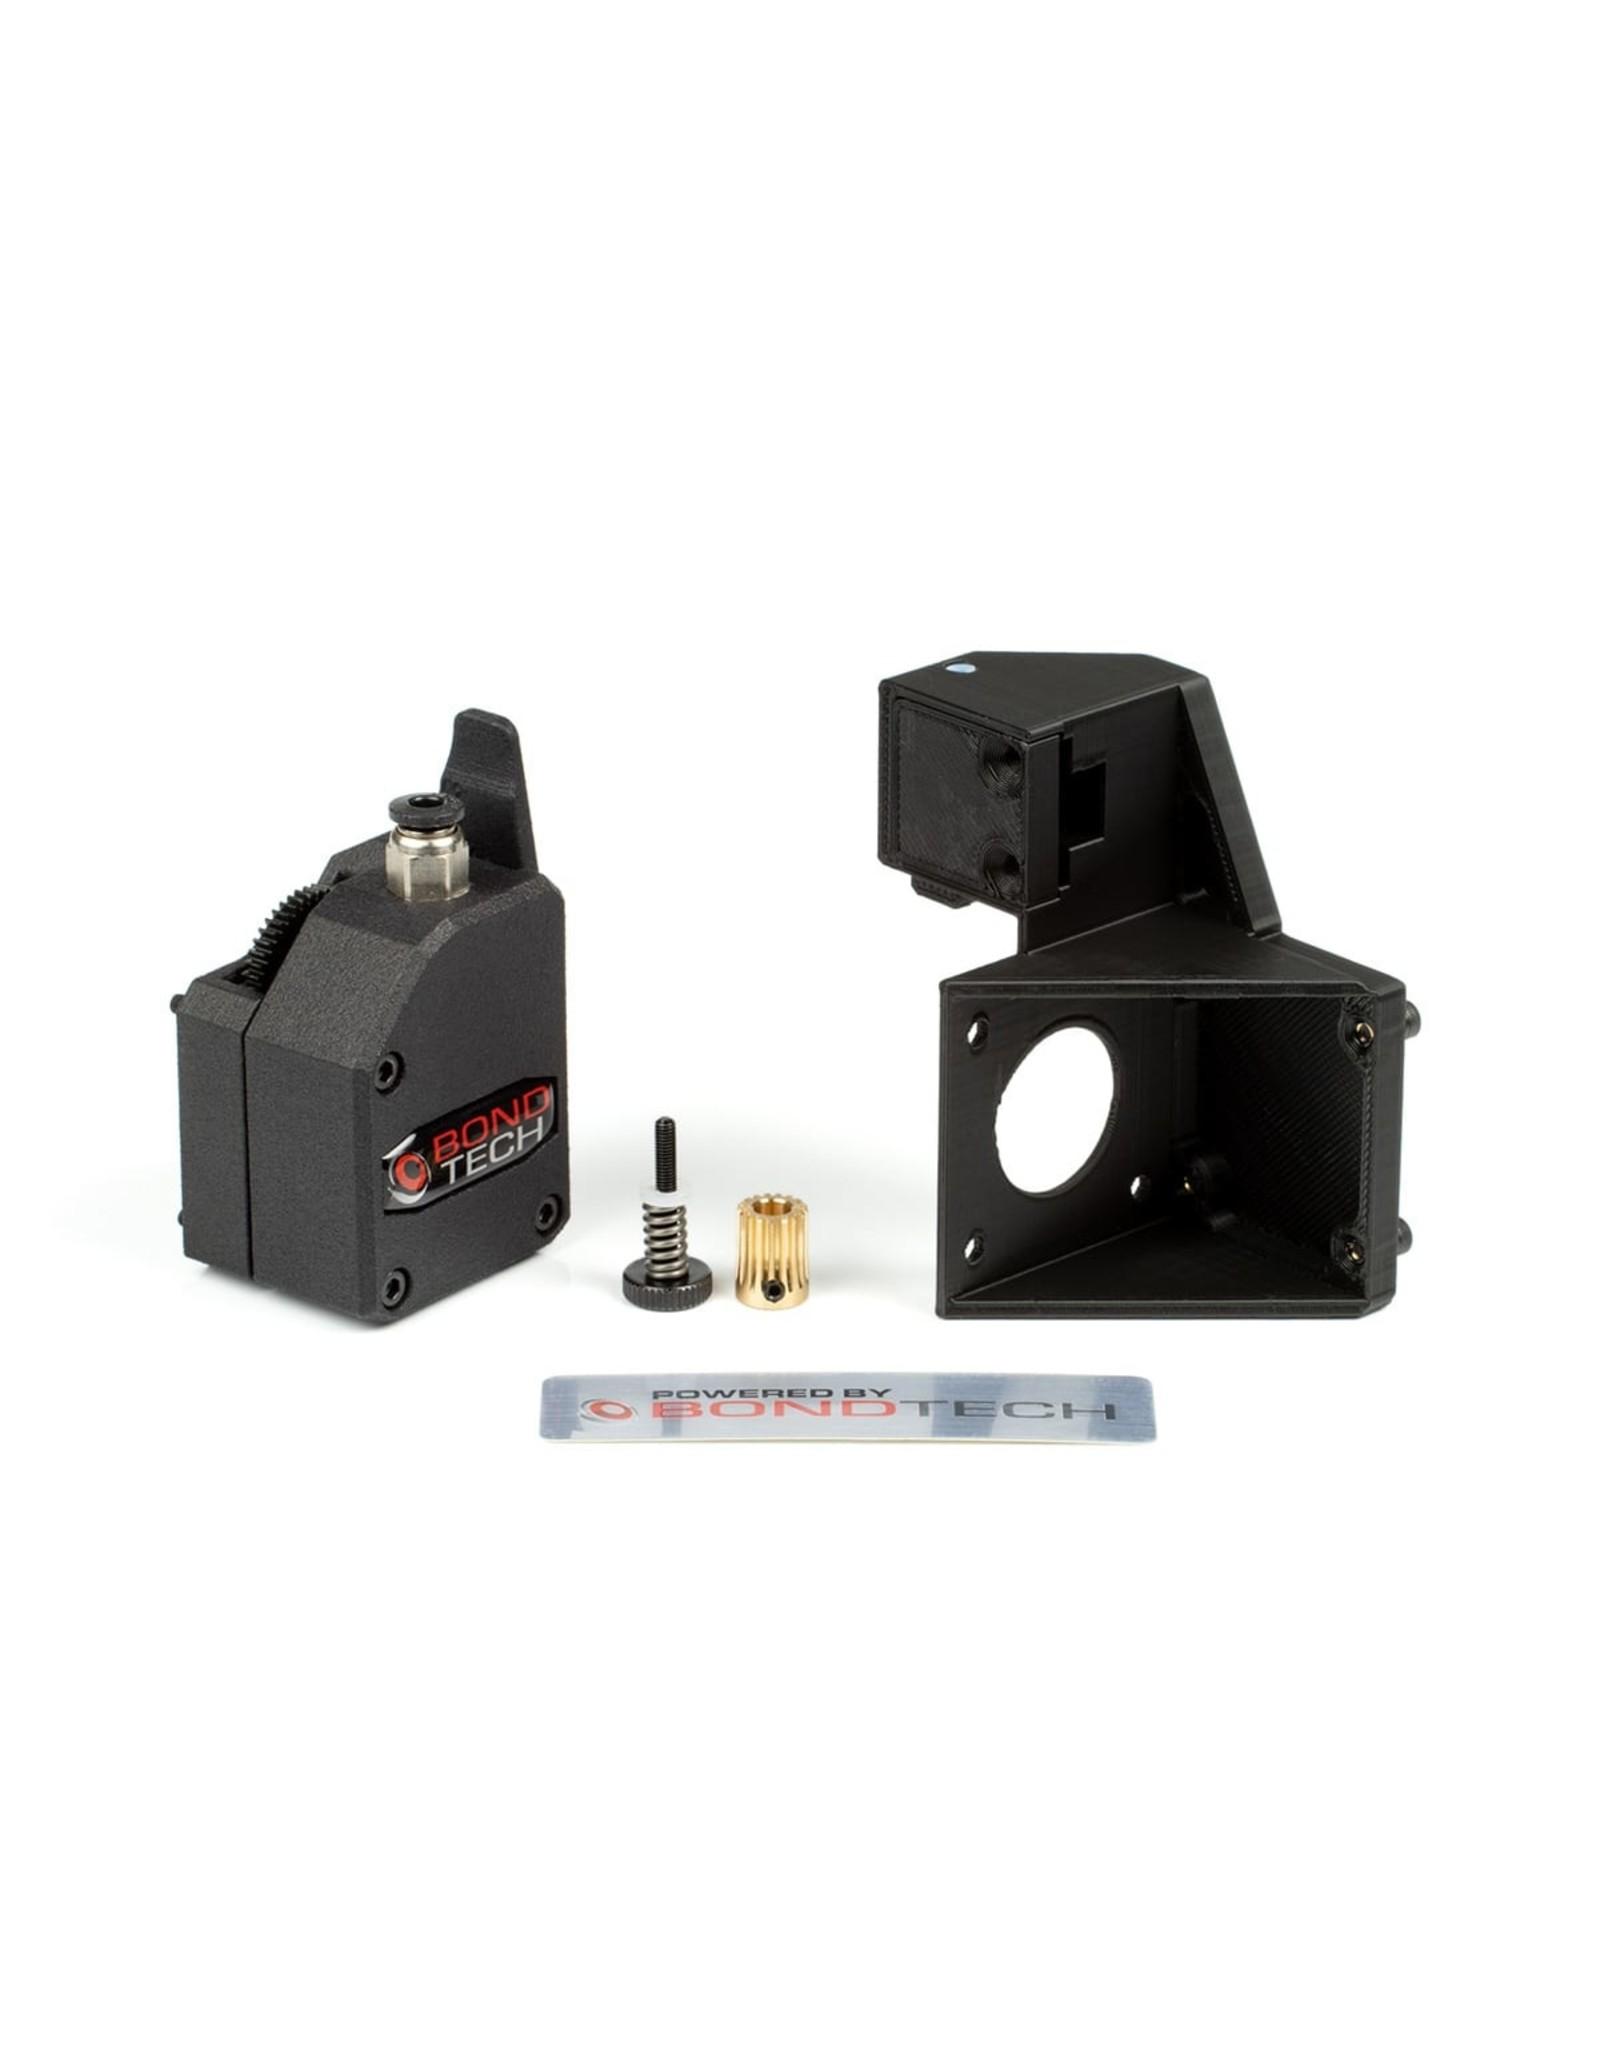 BONDTECH Bondtech Creality3D CR-10S   Extruder upgrade Kit